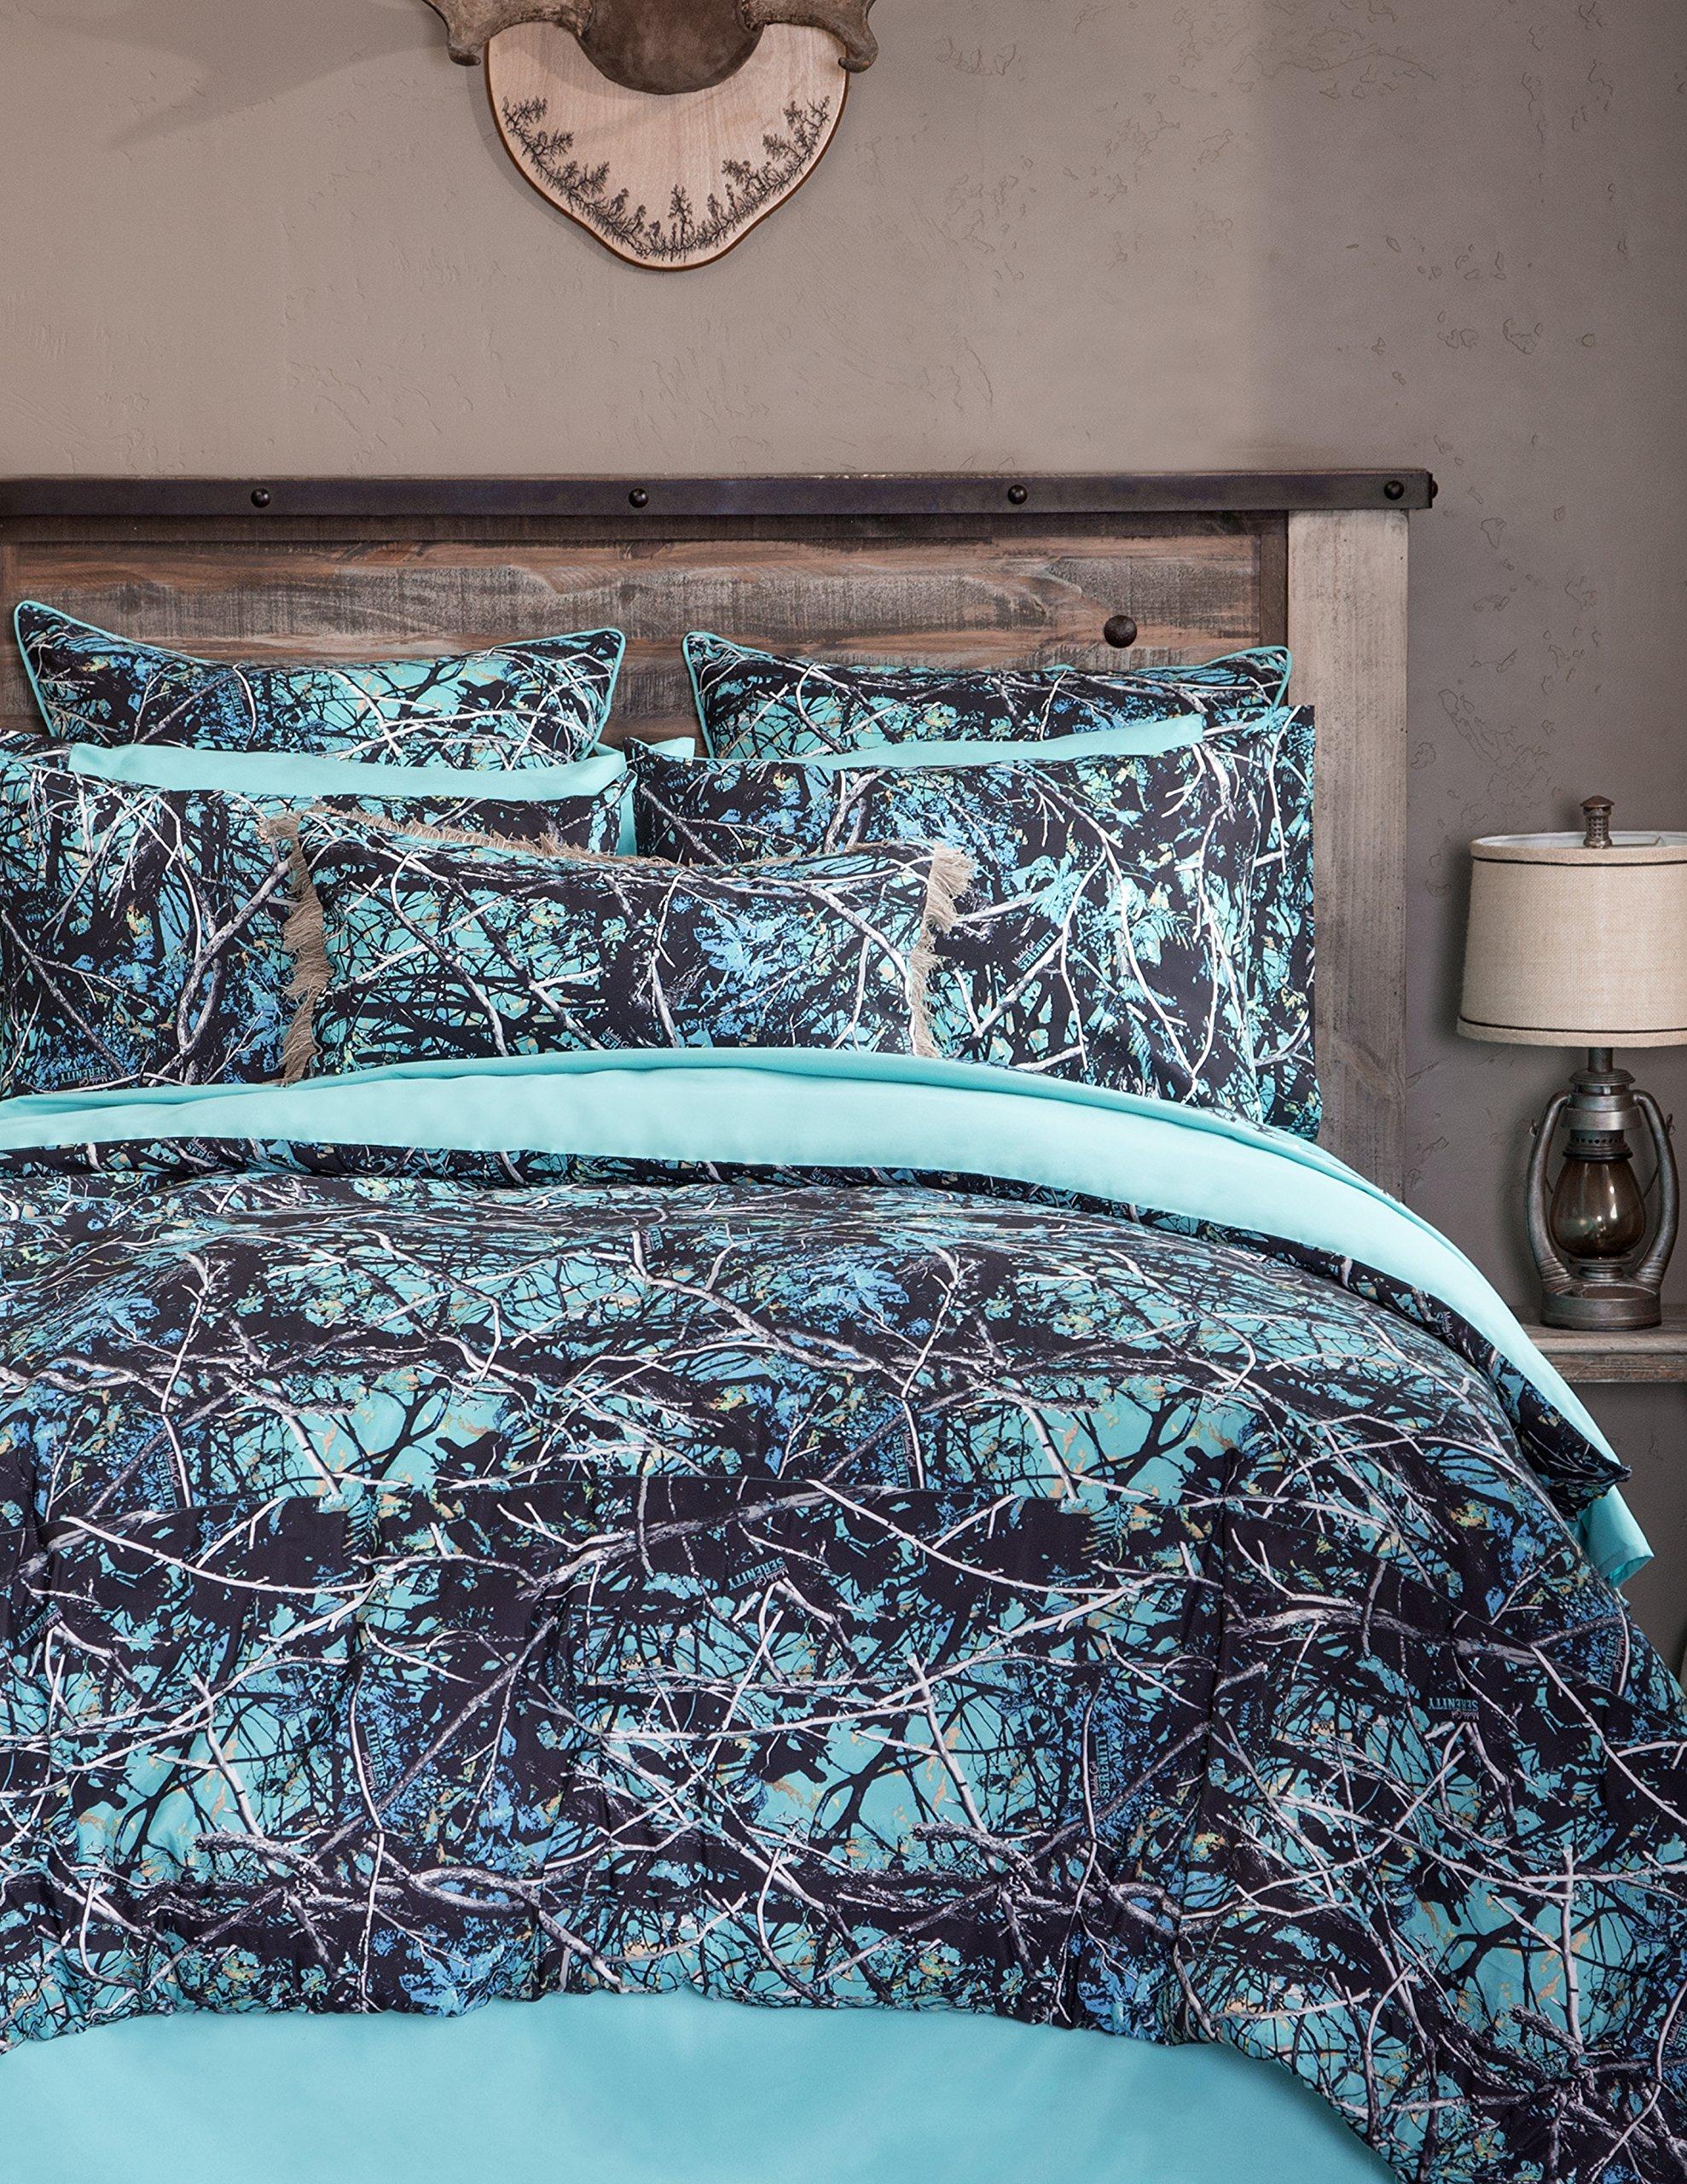 Carstens Muddy Girl Serenity 4 Piece Bedding Set, King